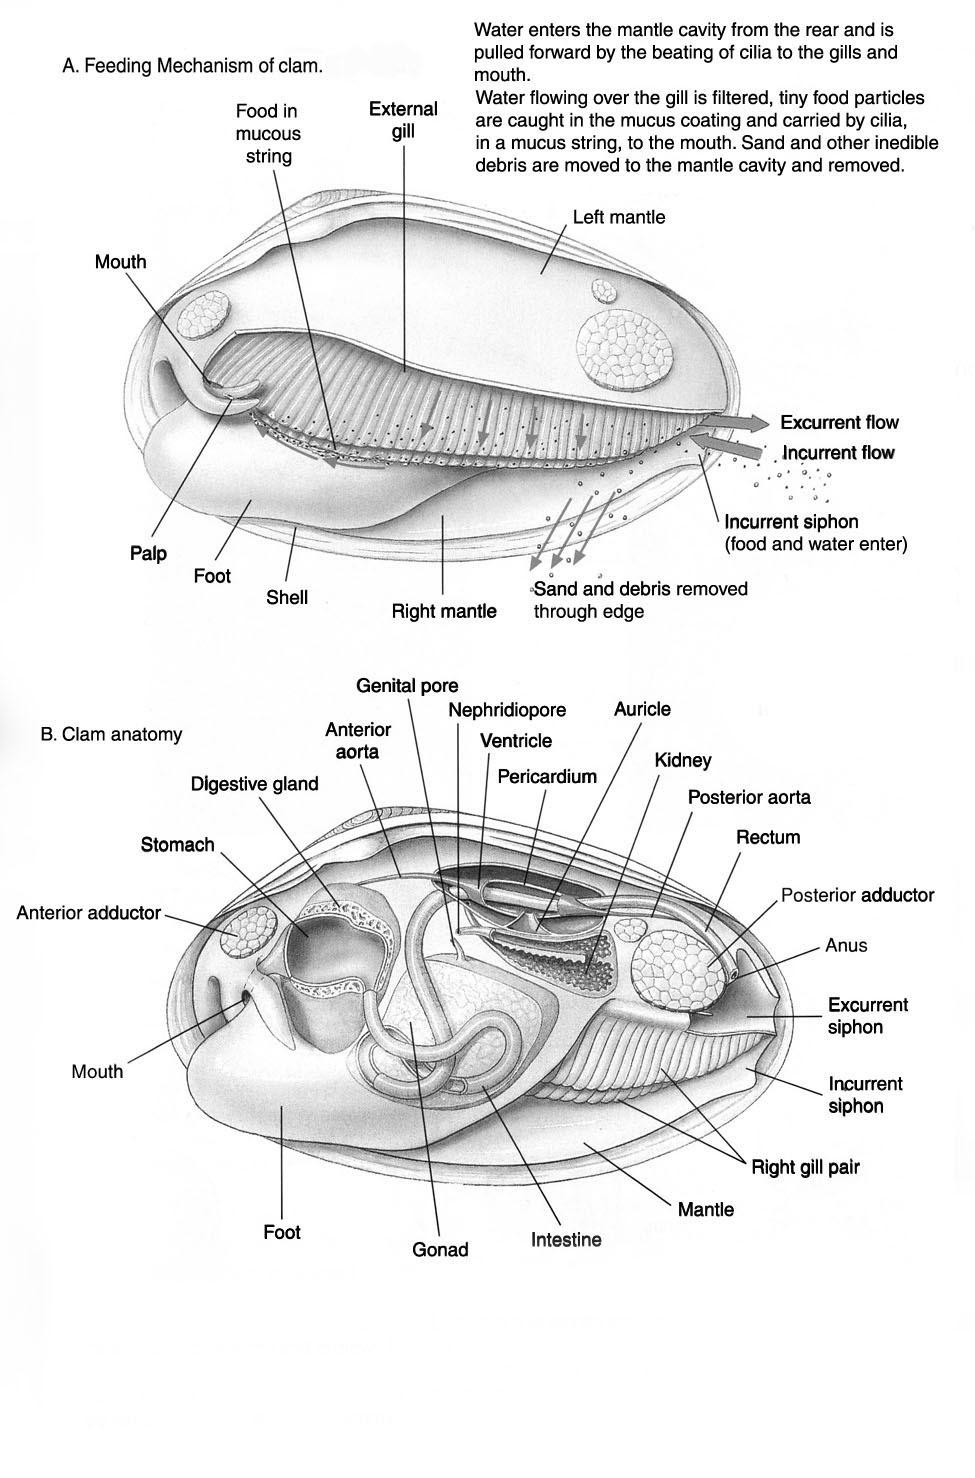 anatomy%20clam